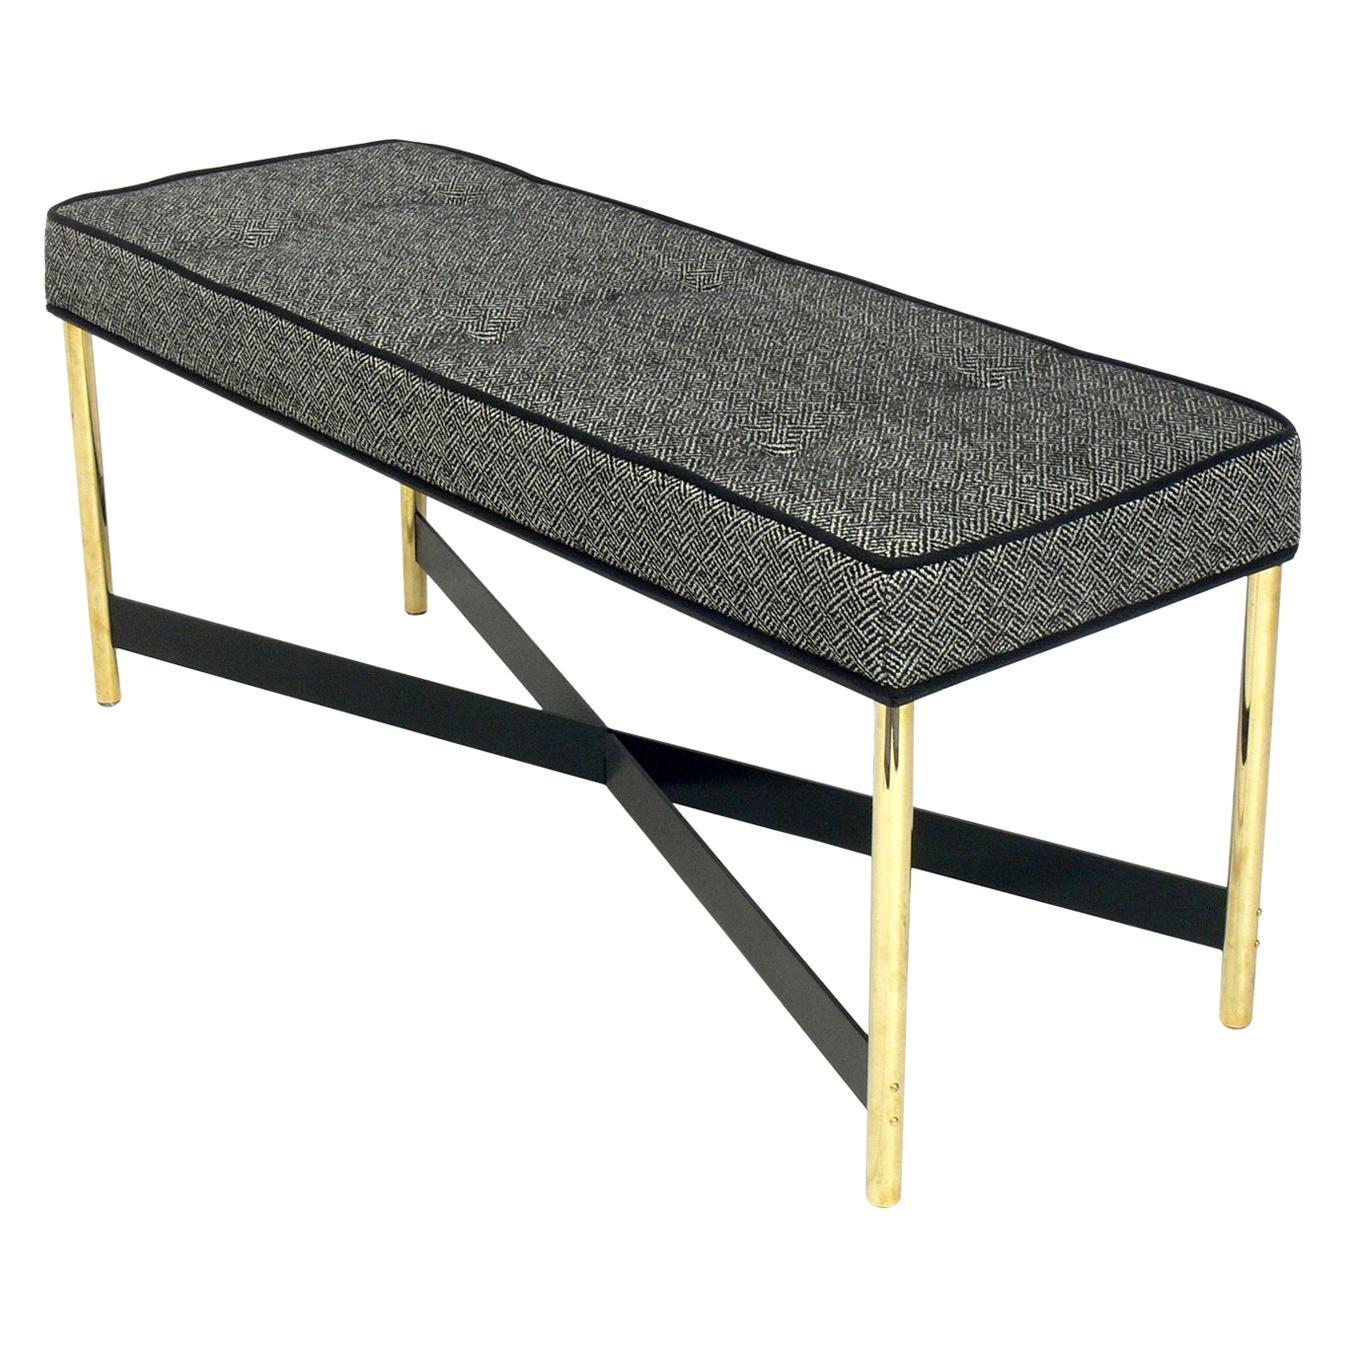 Brass X Base Bench by Laverne International